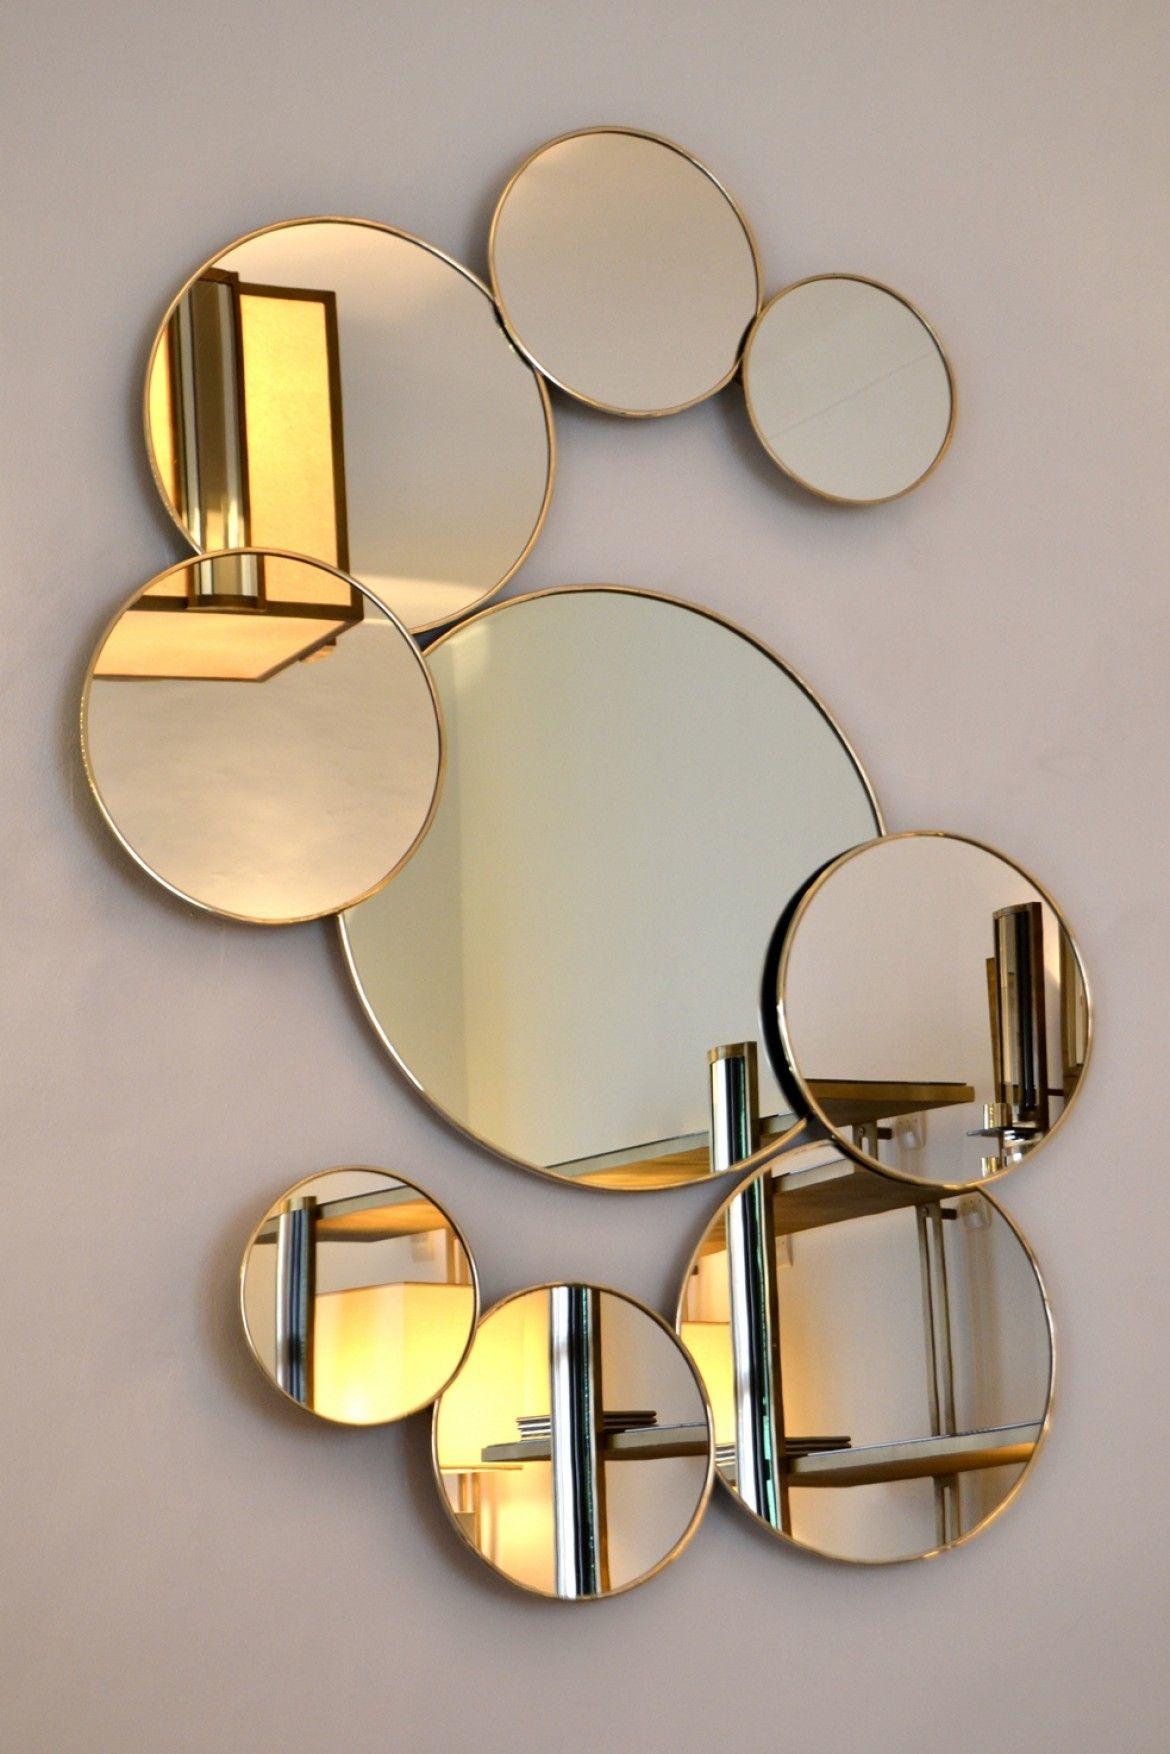 Miroir MOB/MIR/VAR/1 - Atelier Laurence Landon | idee-deco.be ...